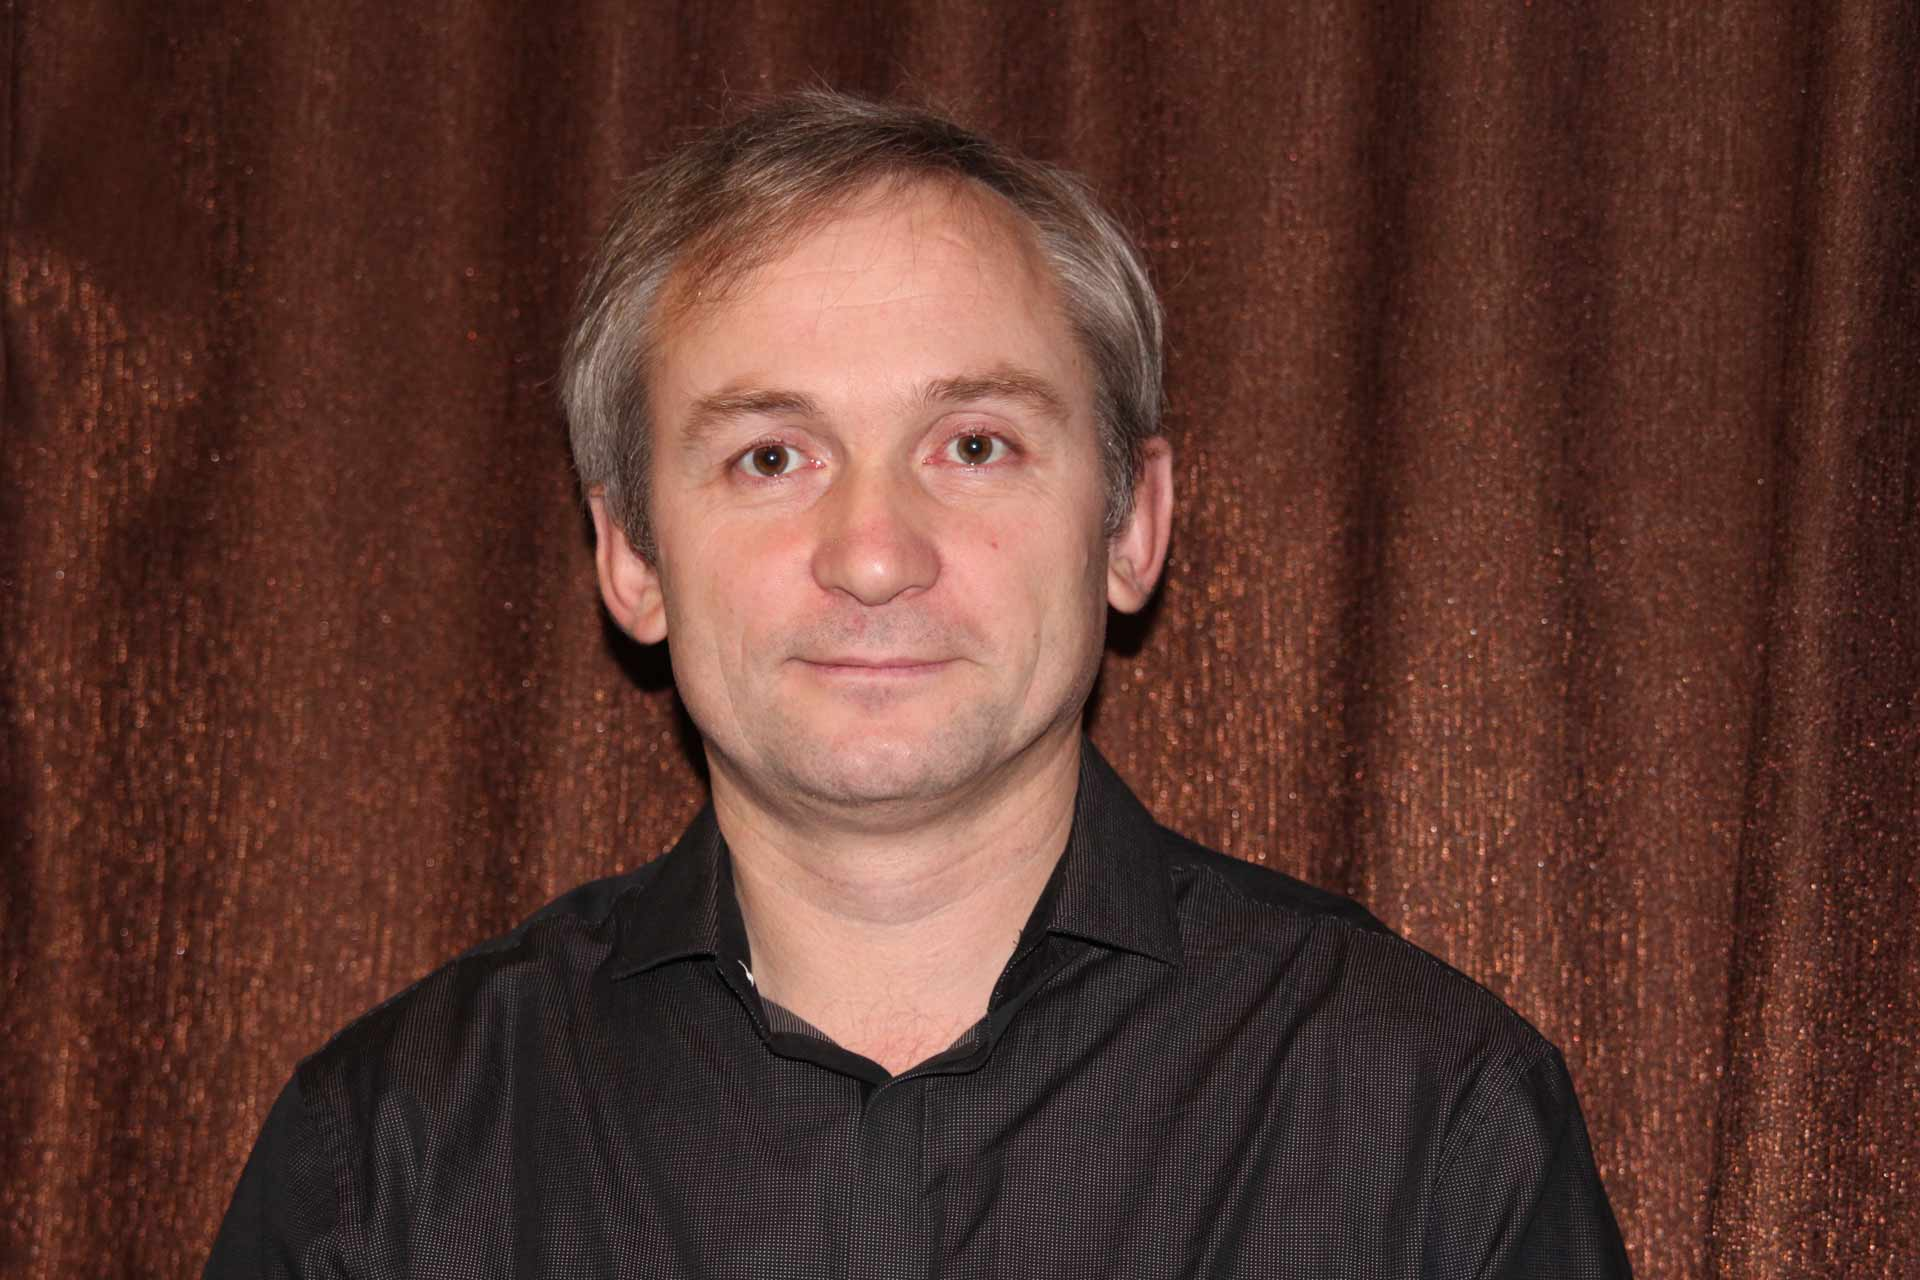 Олег Андриенко. Бизнес и эзотерика